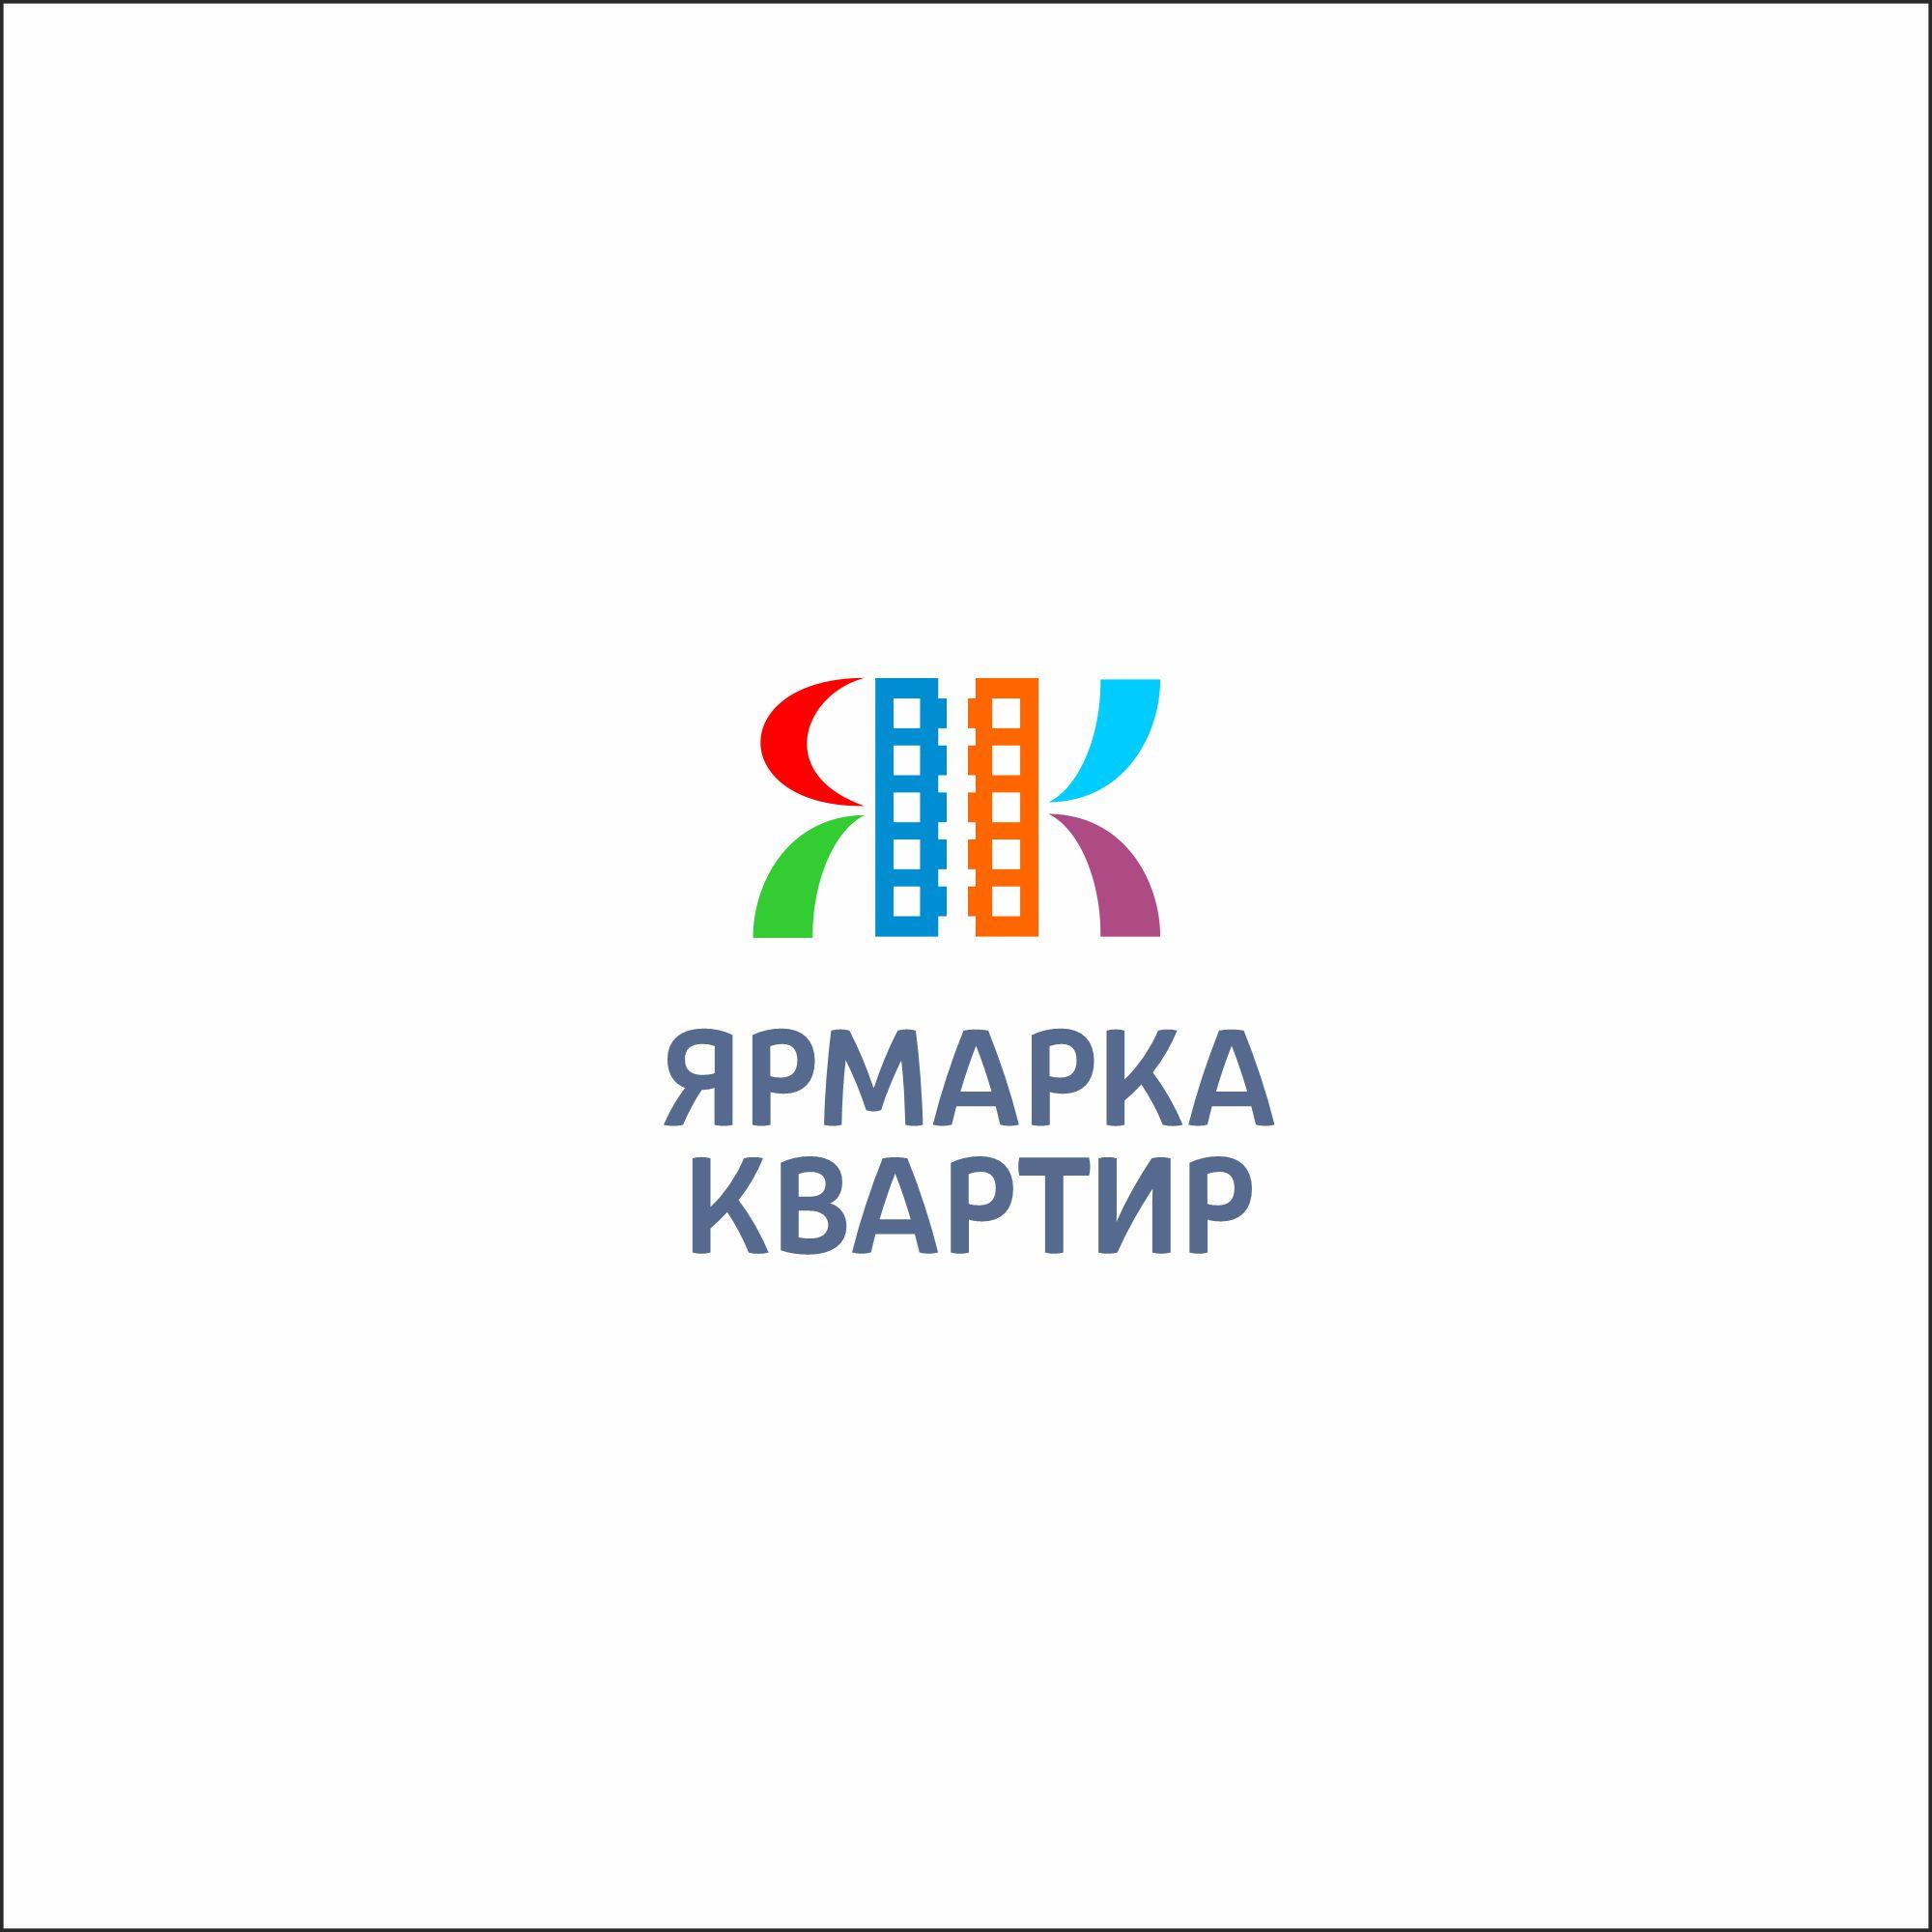 Создание логотипа, с вариантами для визитки и листовки фото f_24160042b993307a.jpg